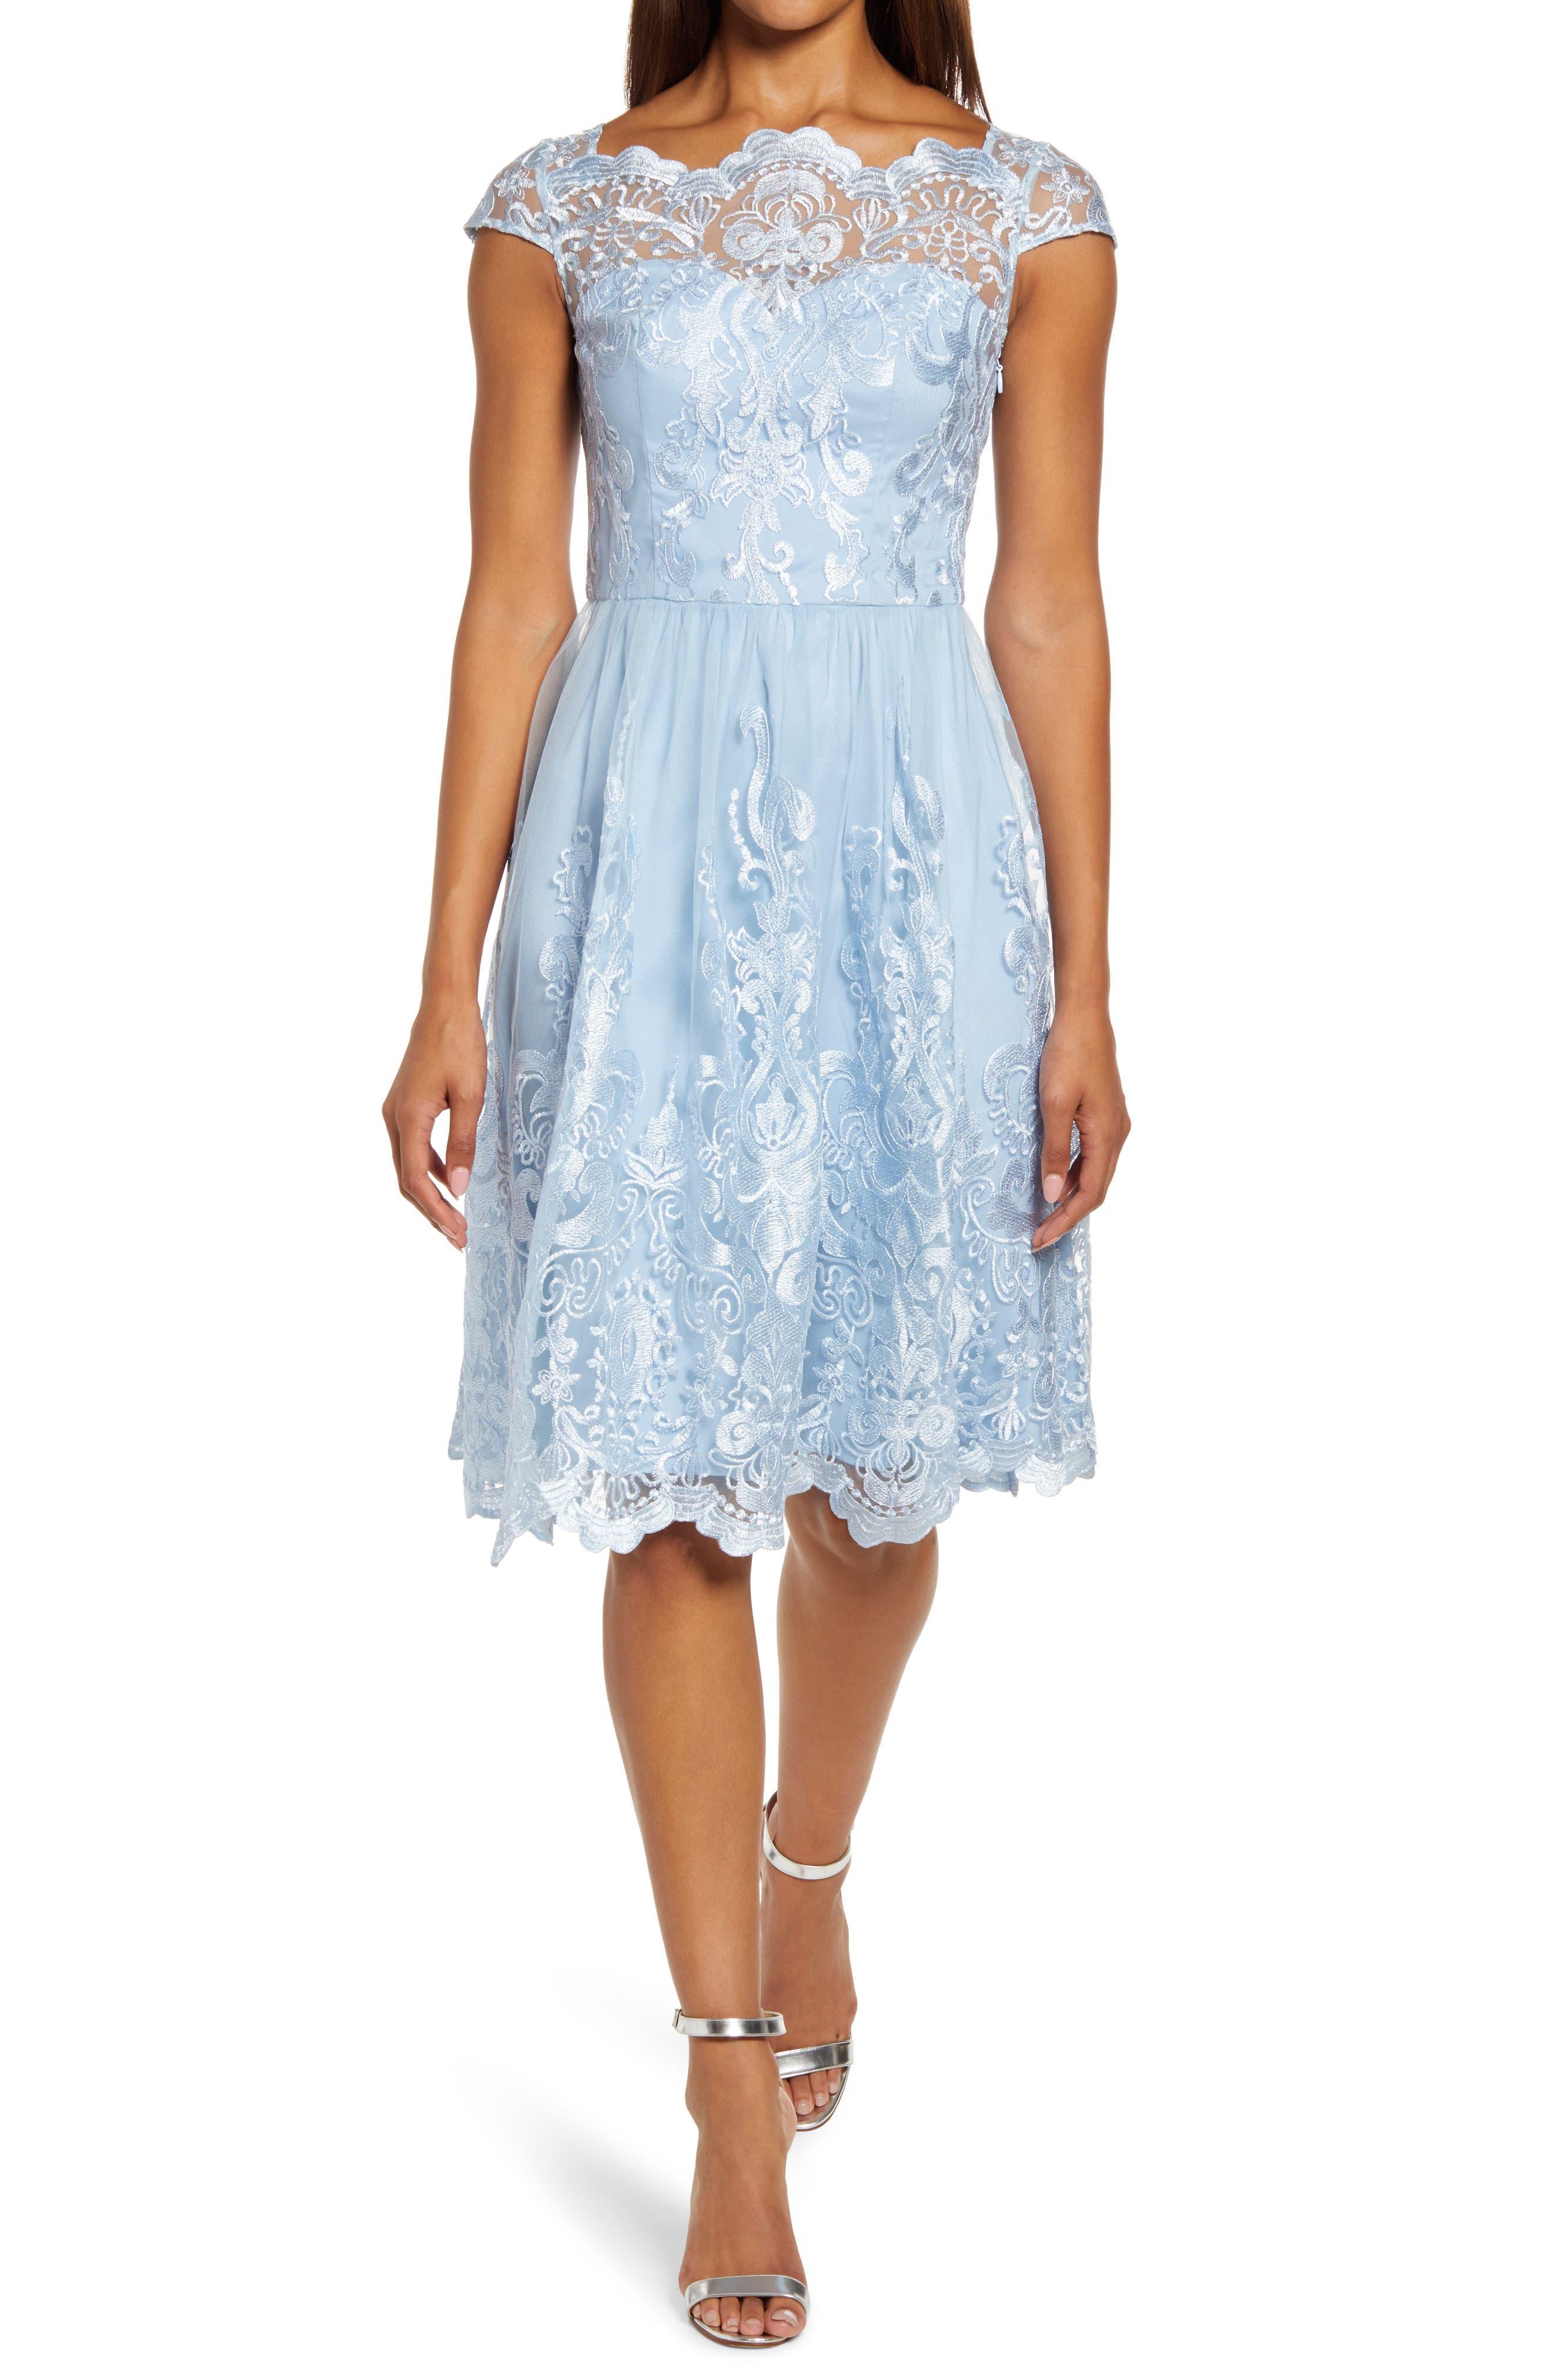 Lace Skater Cocktail Dress